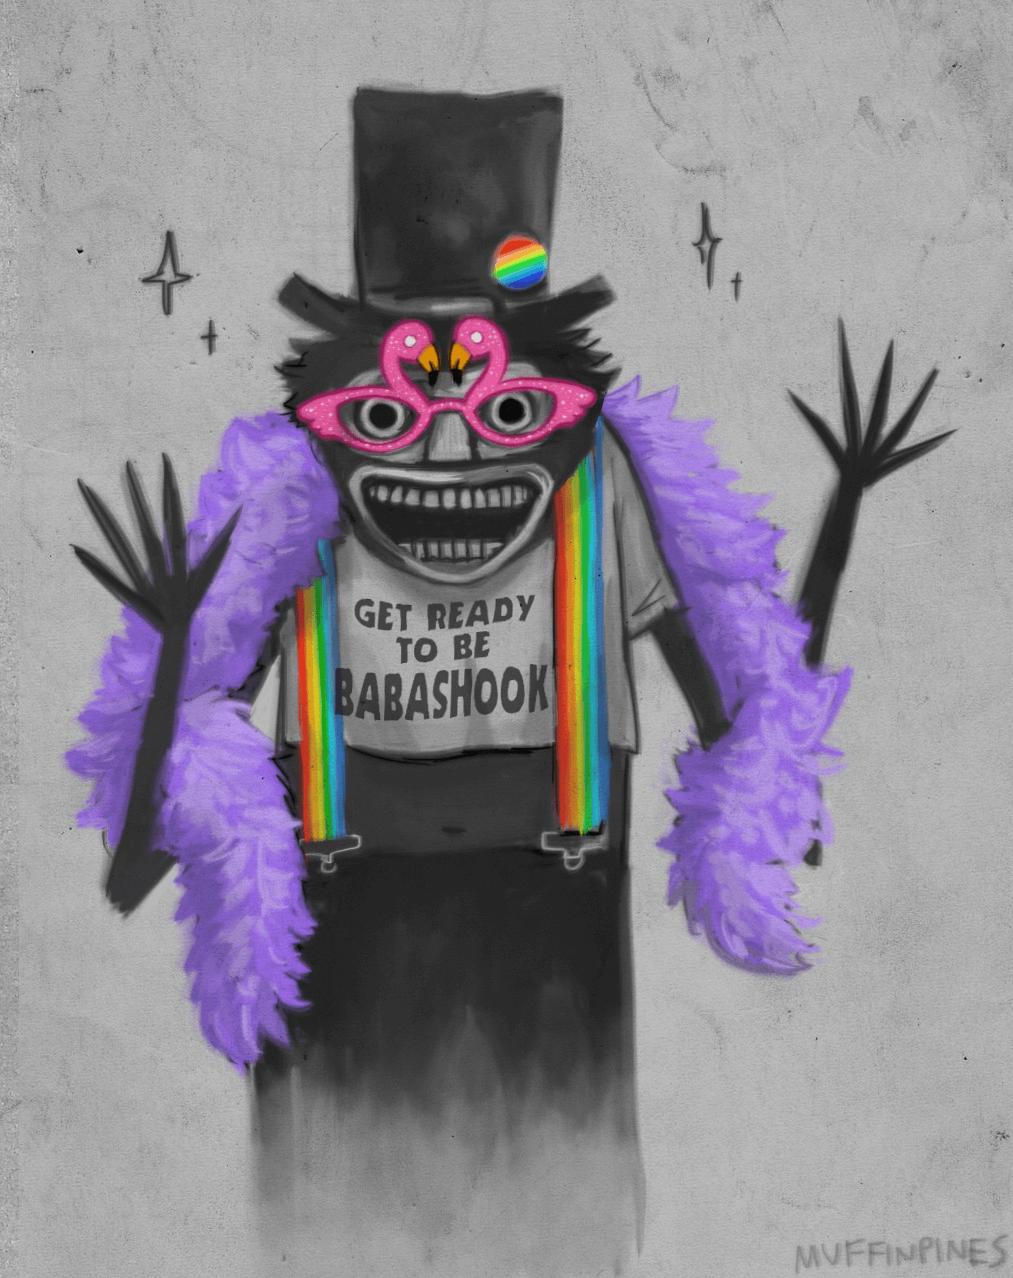 diy babadook pride costume and makeup tutorial - halloween costumes blog